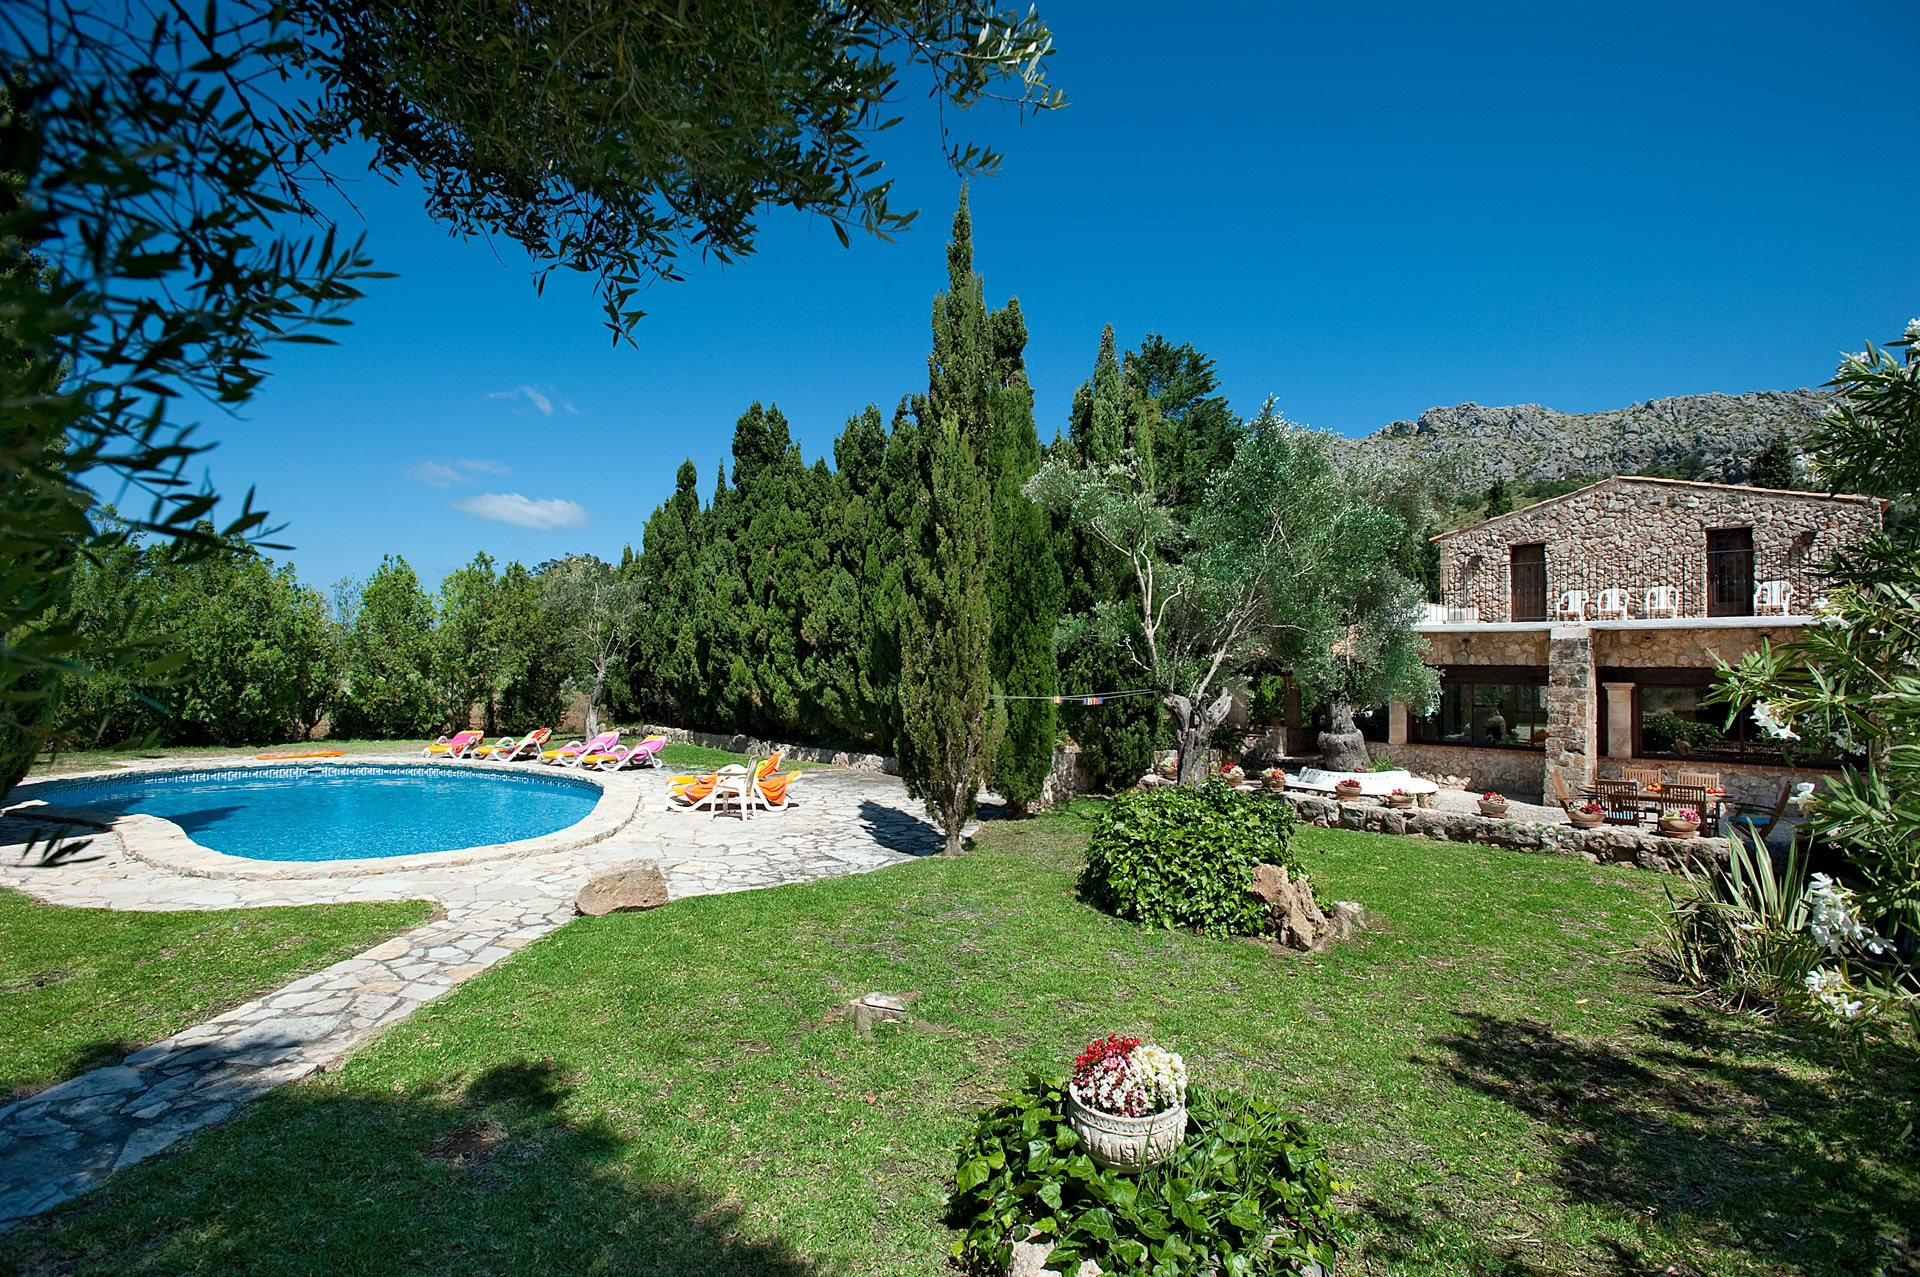 Villa Martorellet, Cala San Vicente, Majorca, Spain